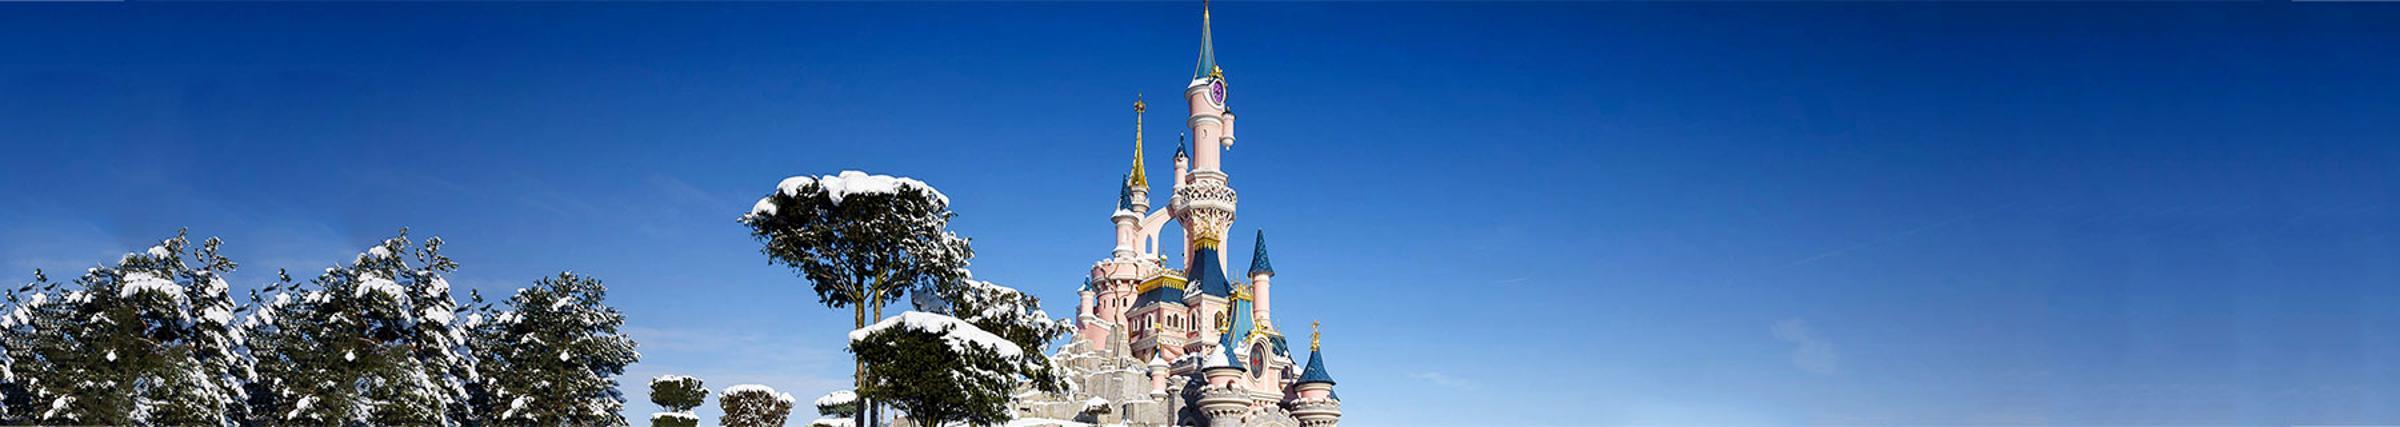 n029048_2025feb07_world_disneylandparis-castle-under-the-snow-2018_45-8_tcm808-210717$w~2400$p~1